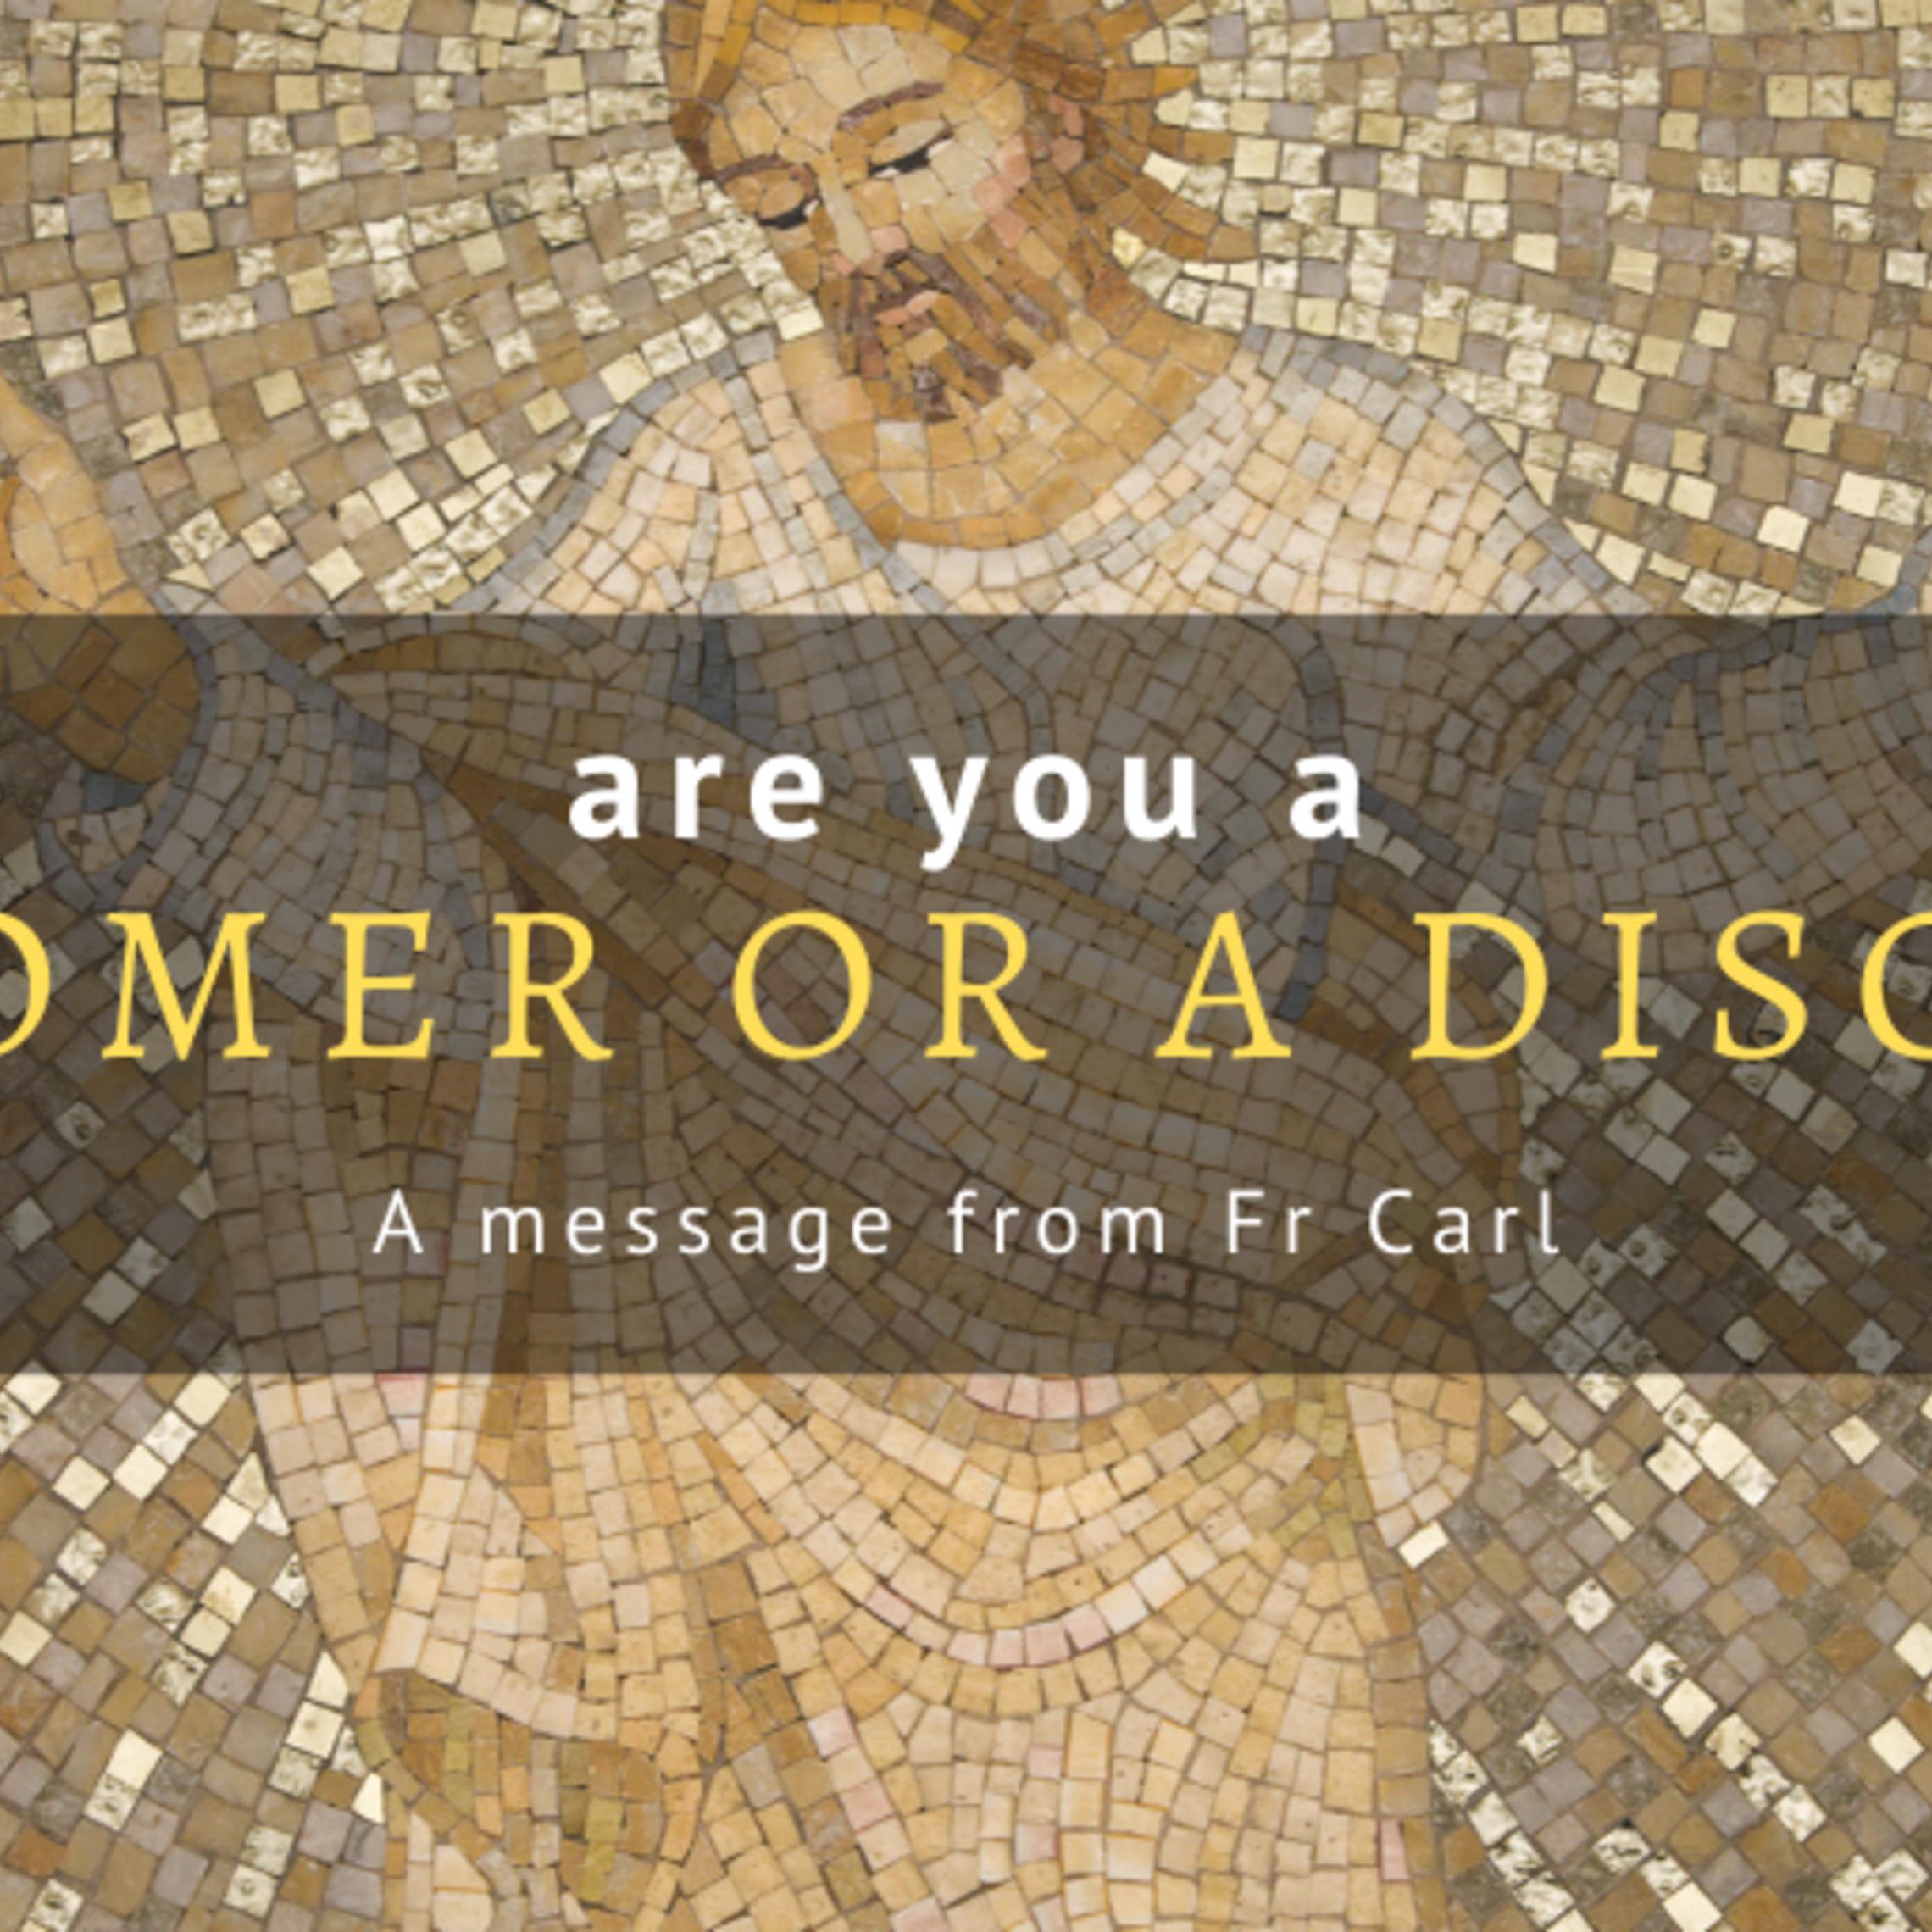 Customer Or Disciple